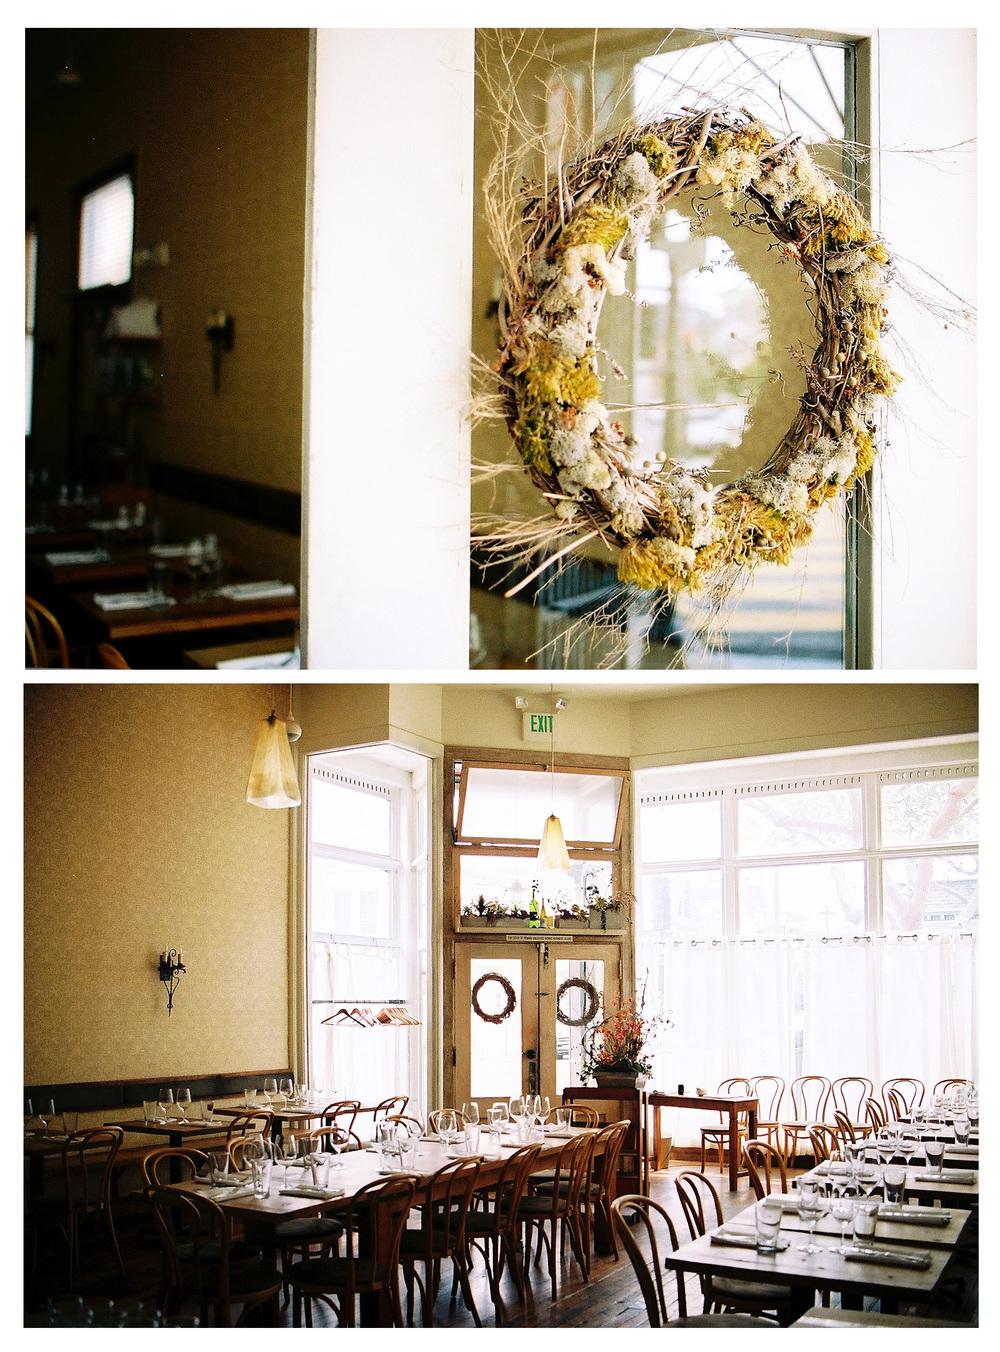 wreath and room.jpg